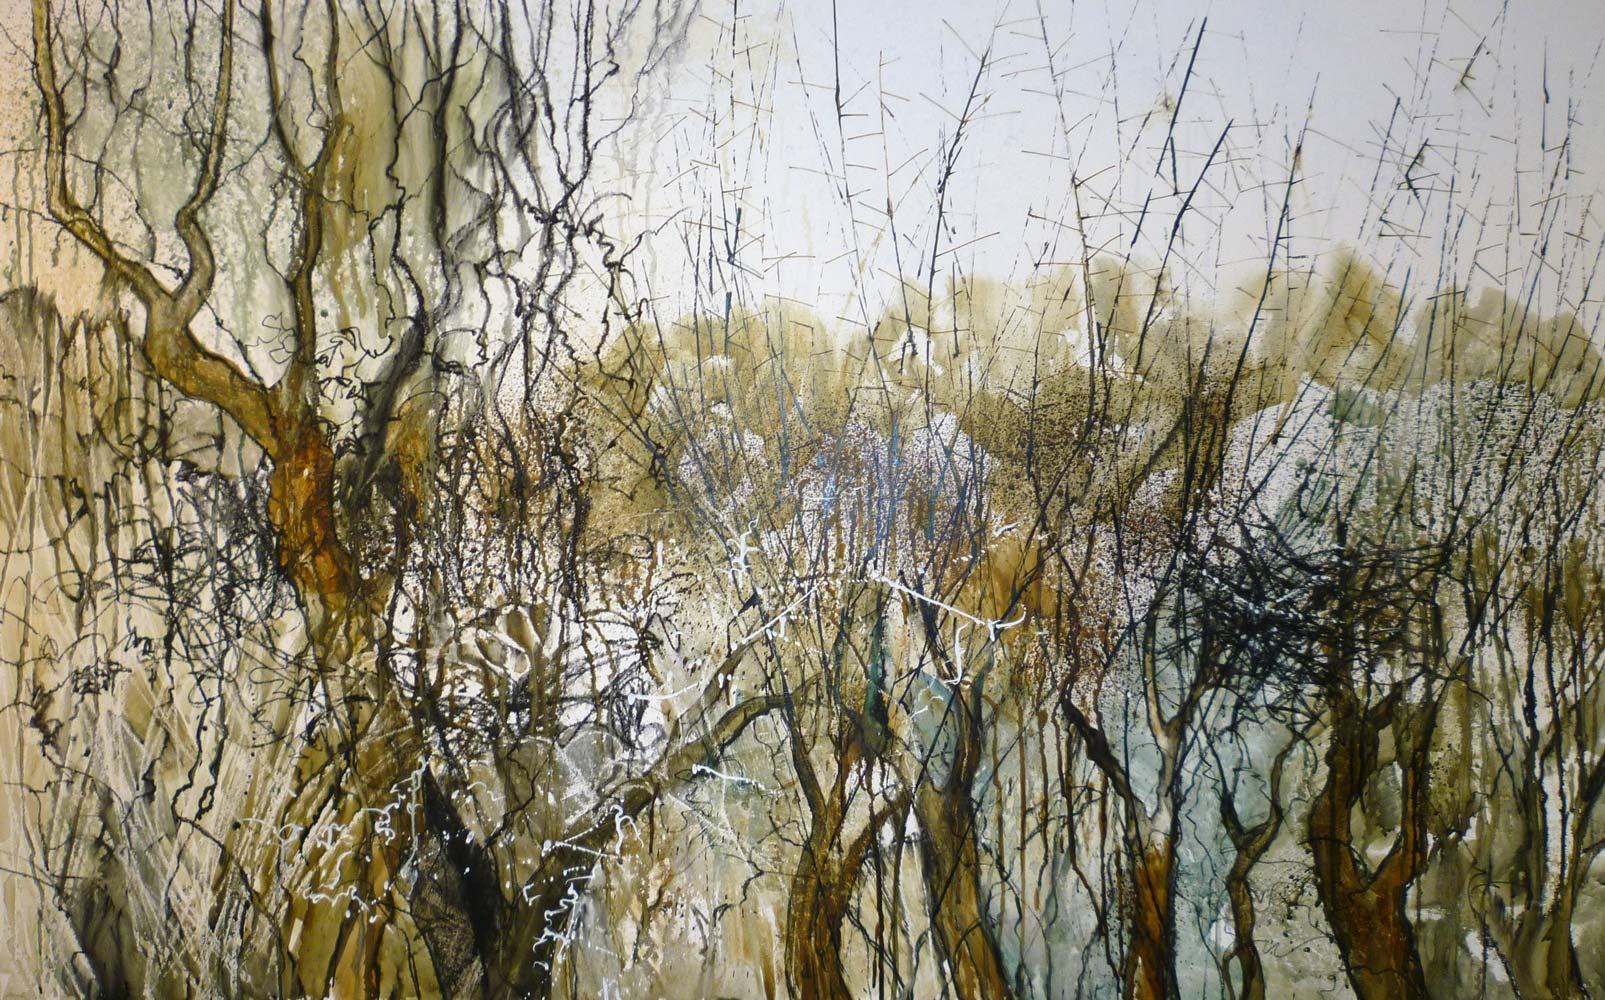 Winter hedgerow 4